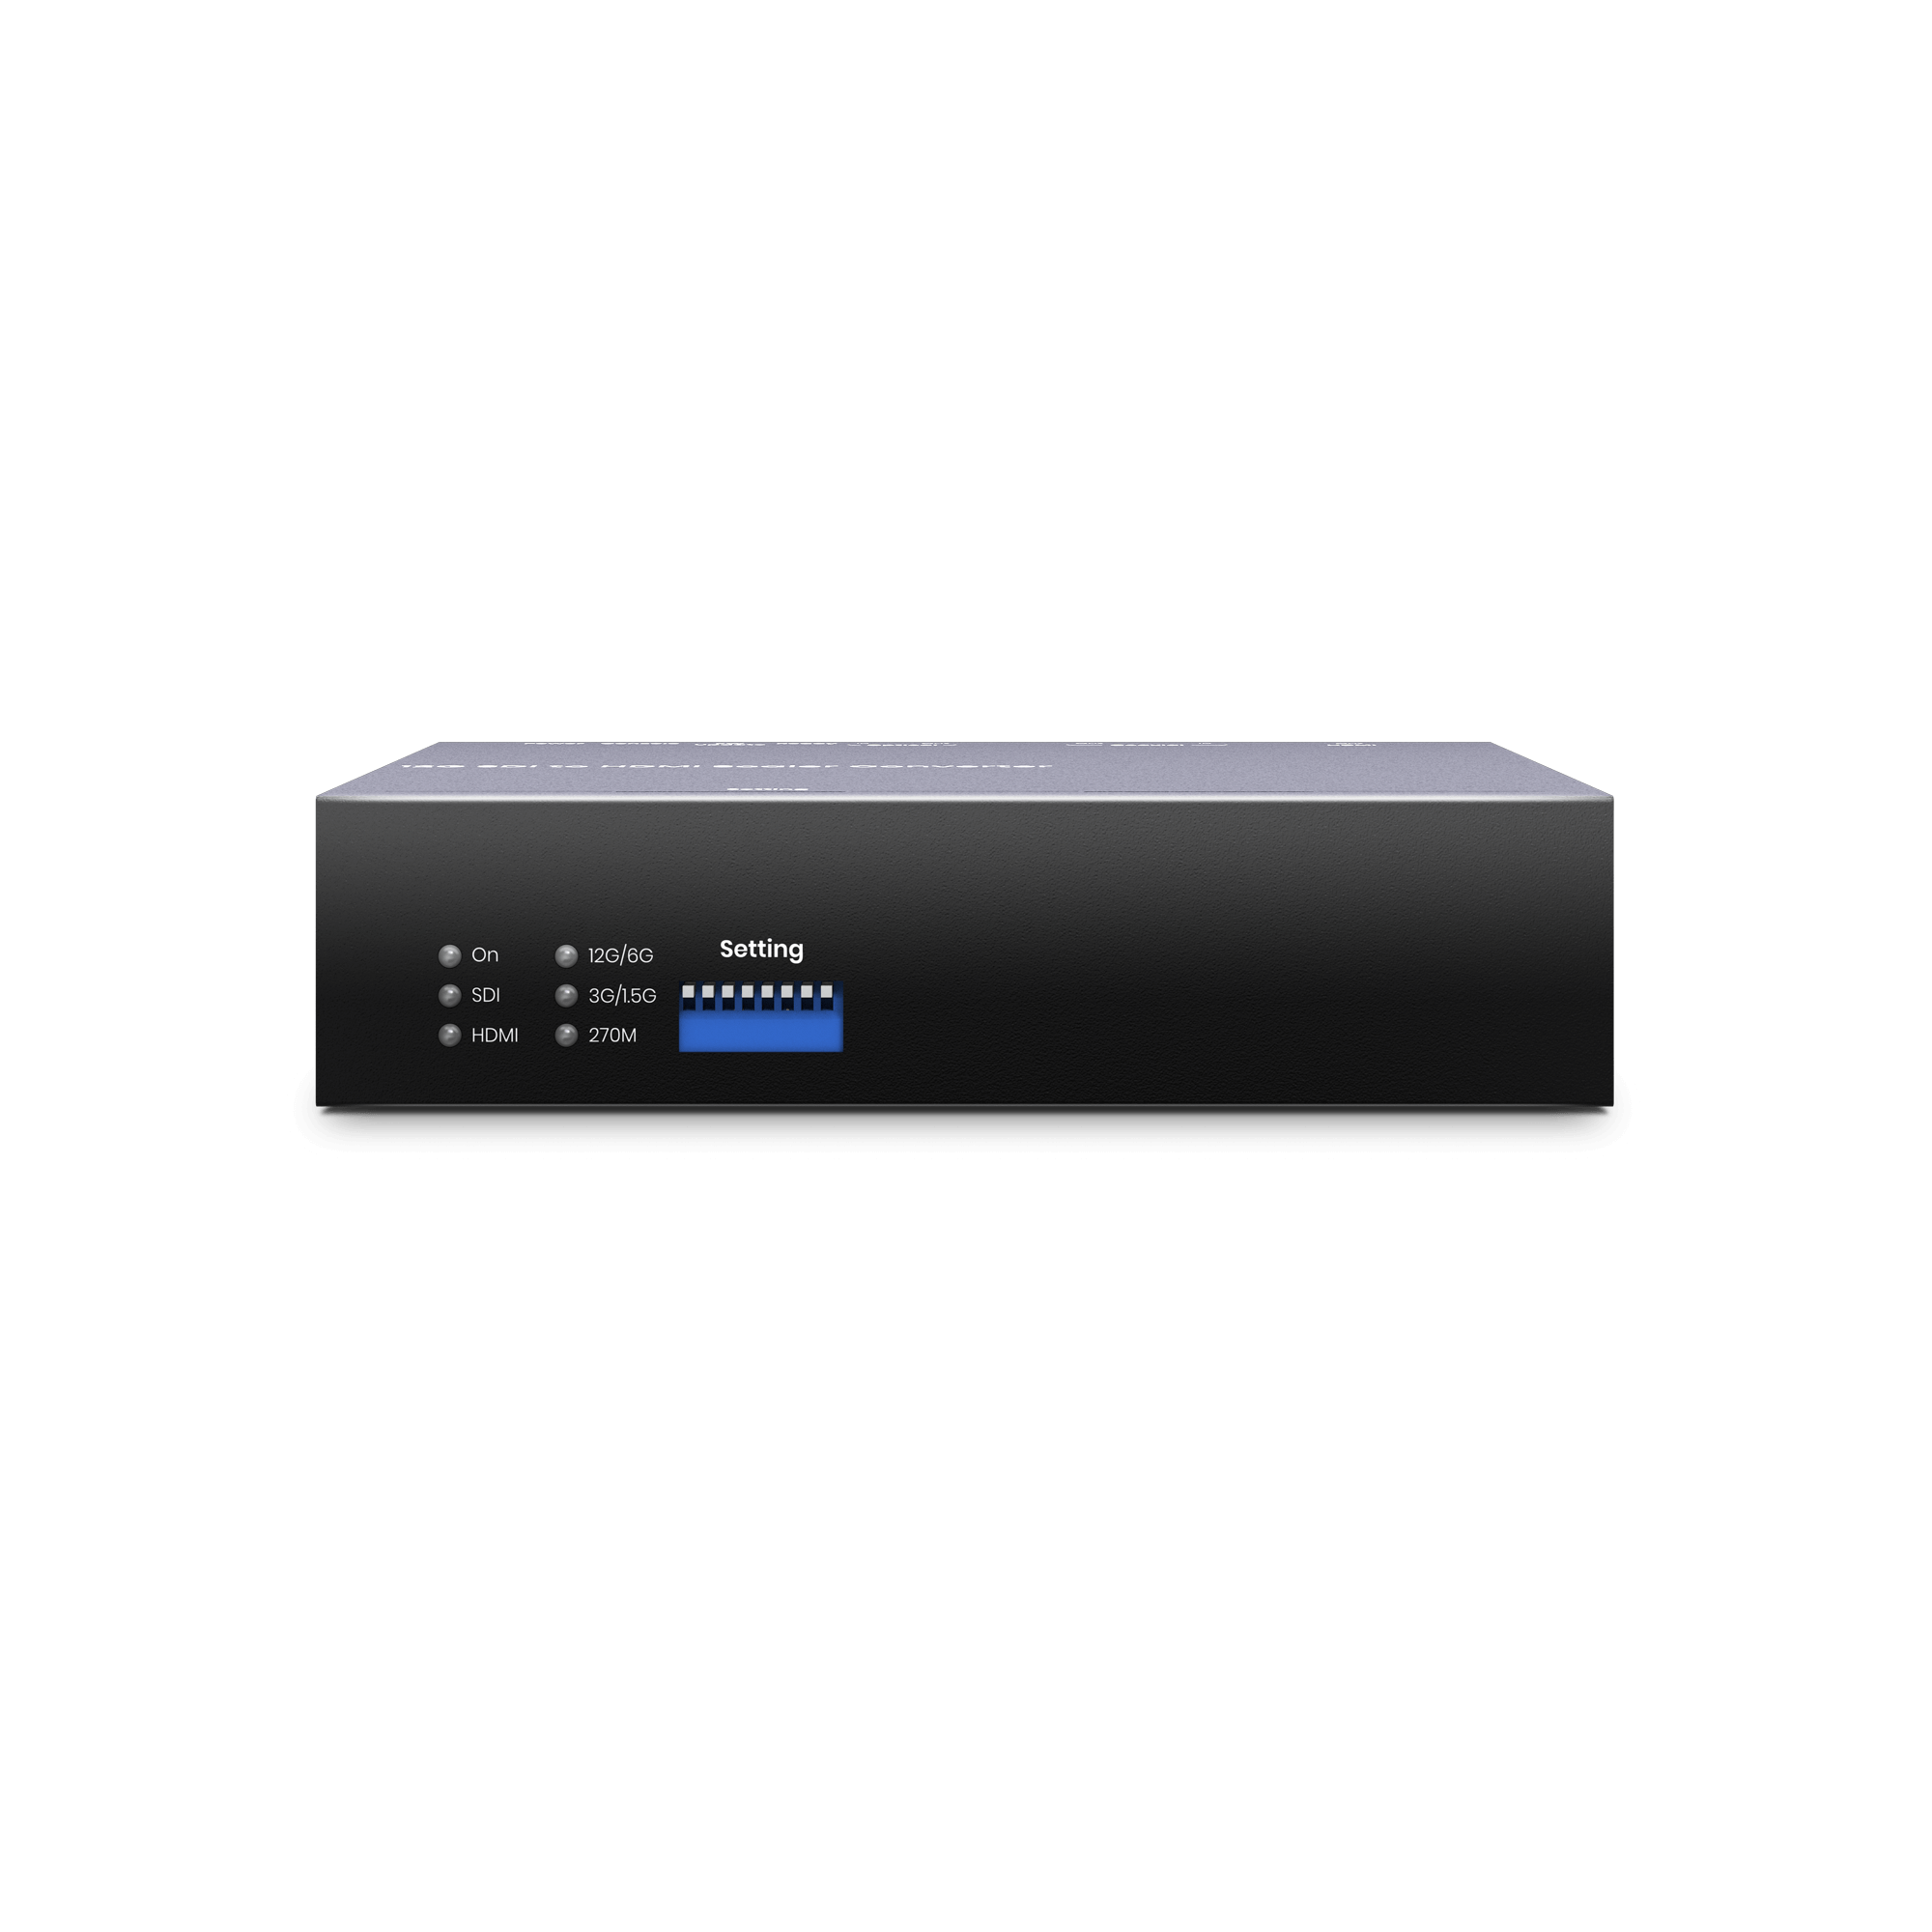 12G-SDI to HDMI 2.0 Converter